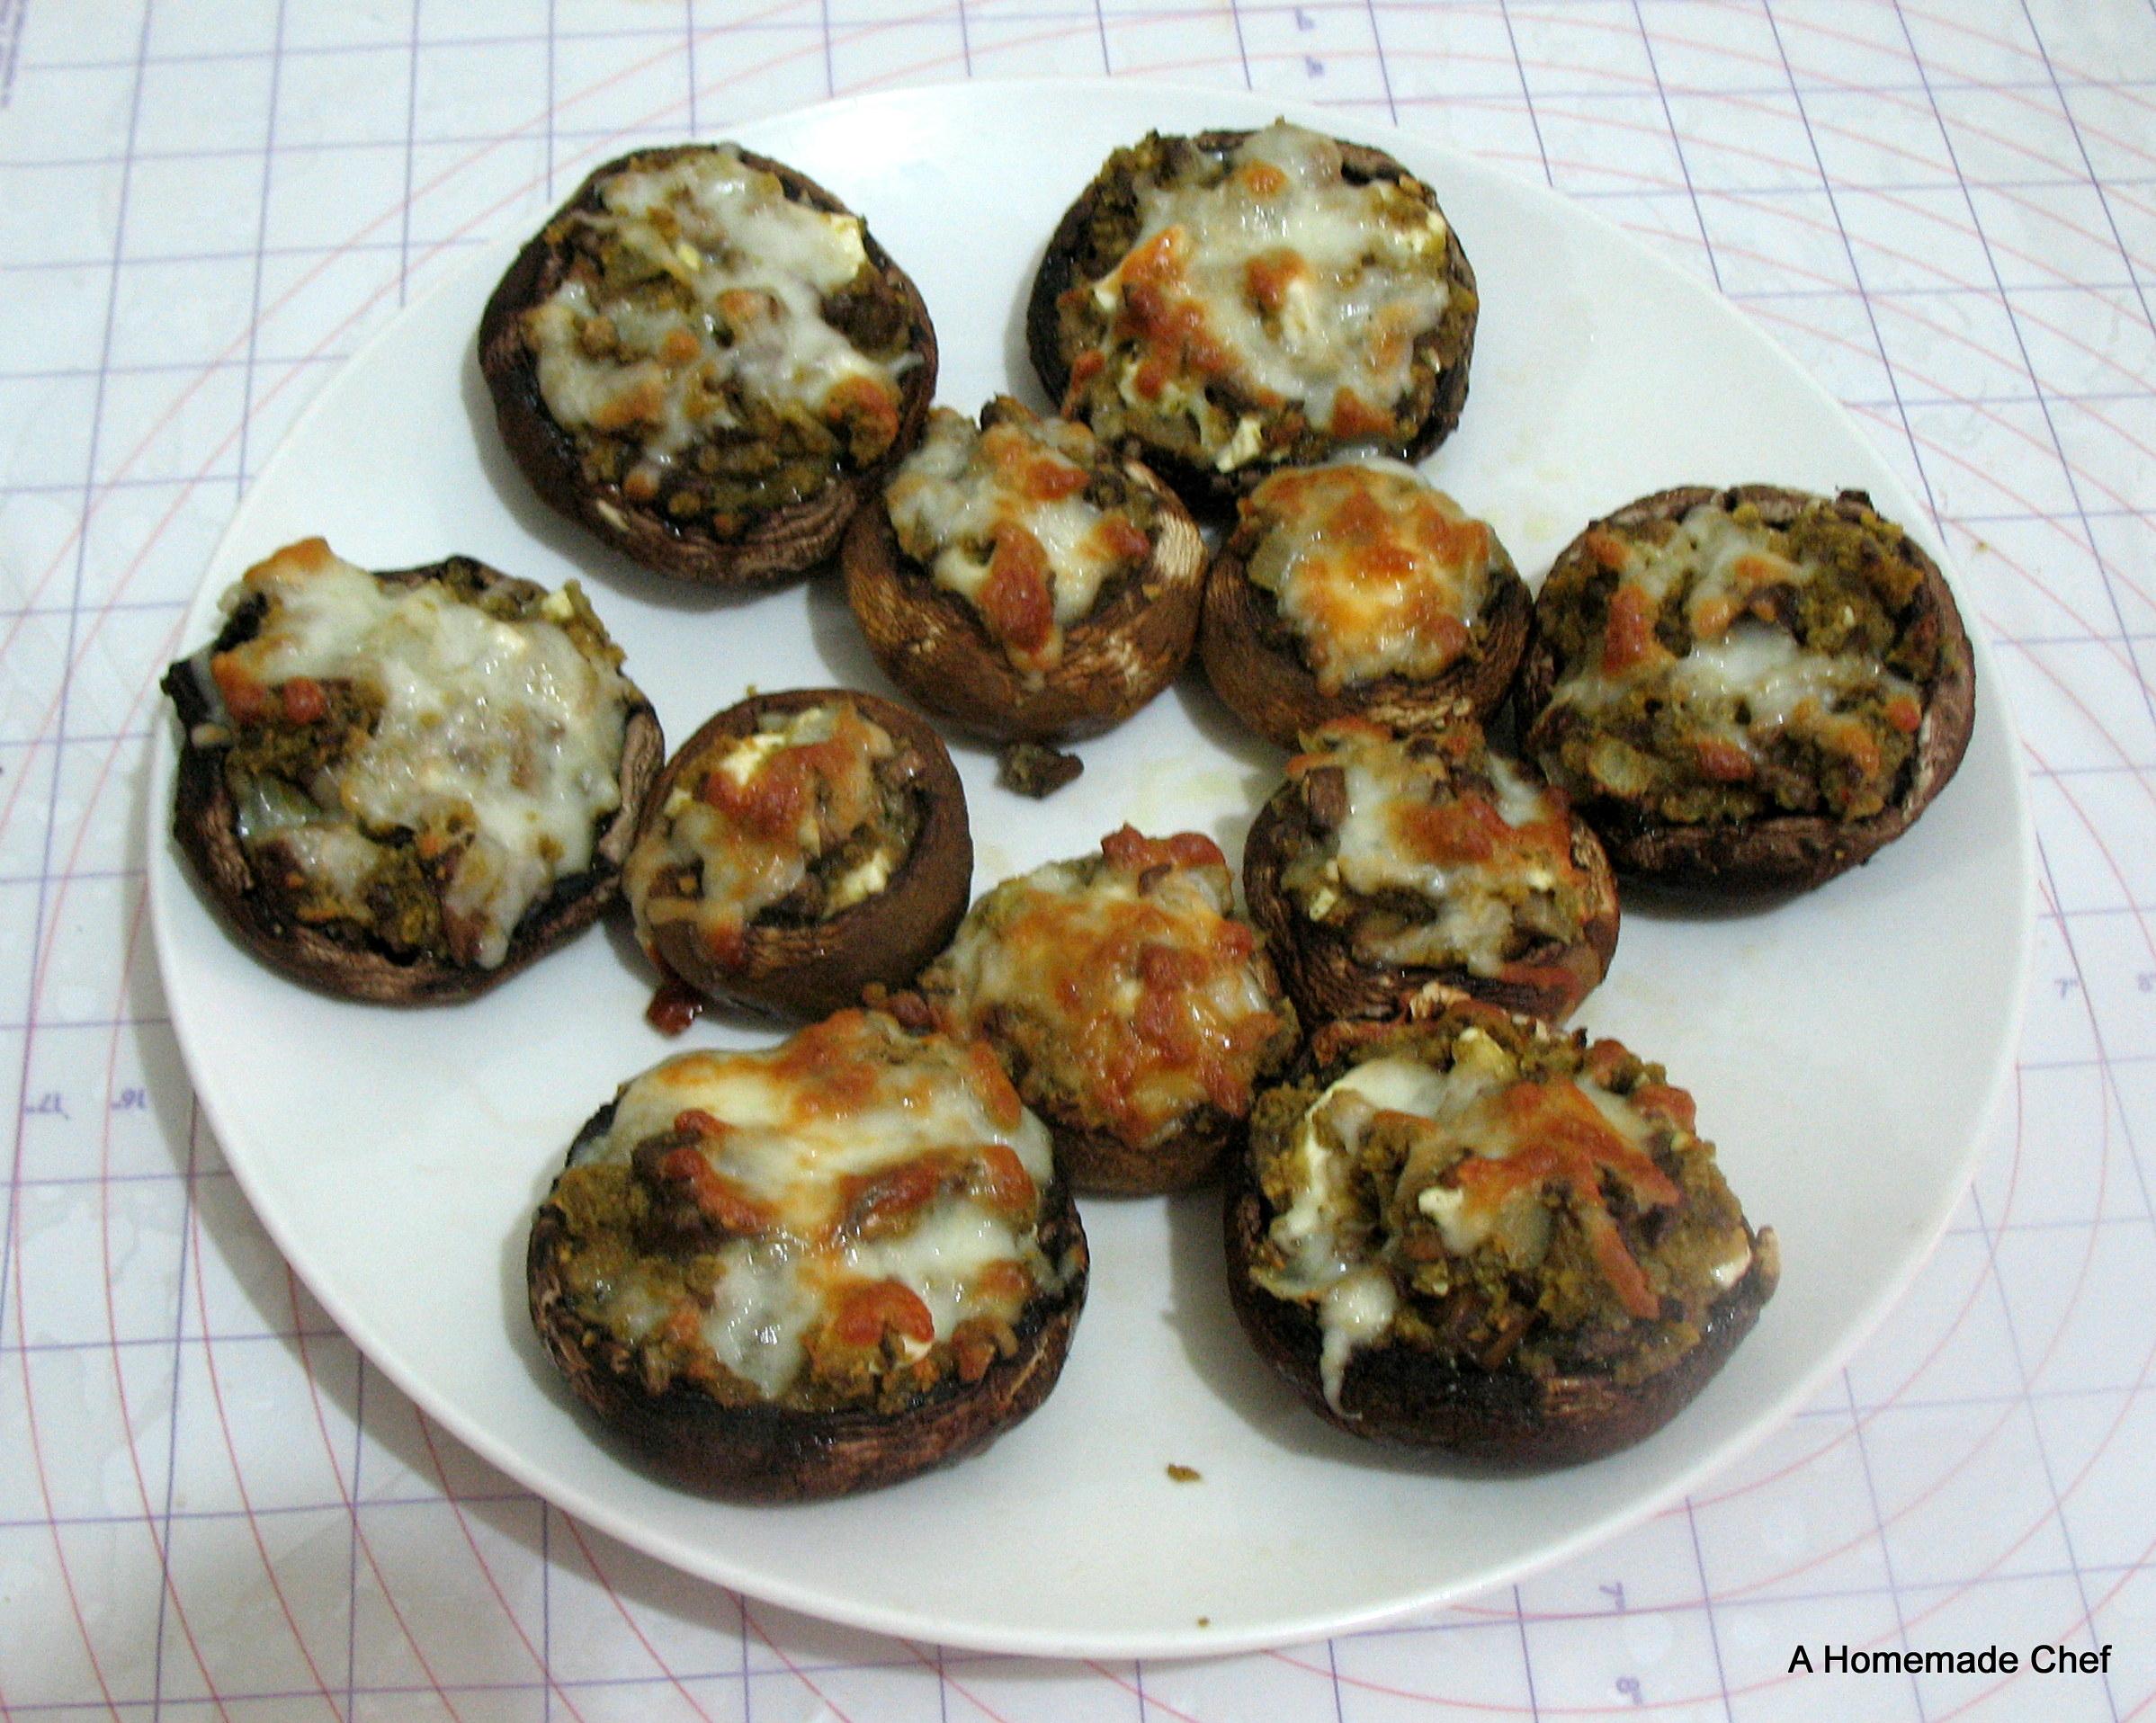 Stuffed Mushrooms with Pesto and Feta Cheese - A Homemade Chef